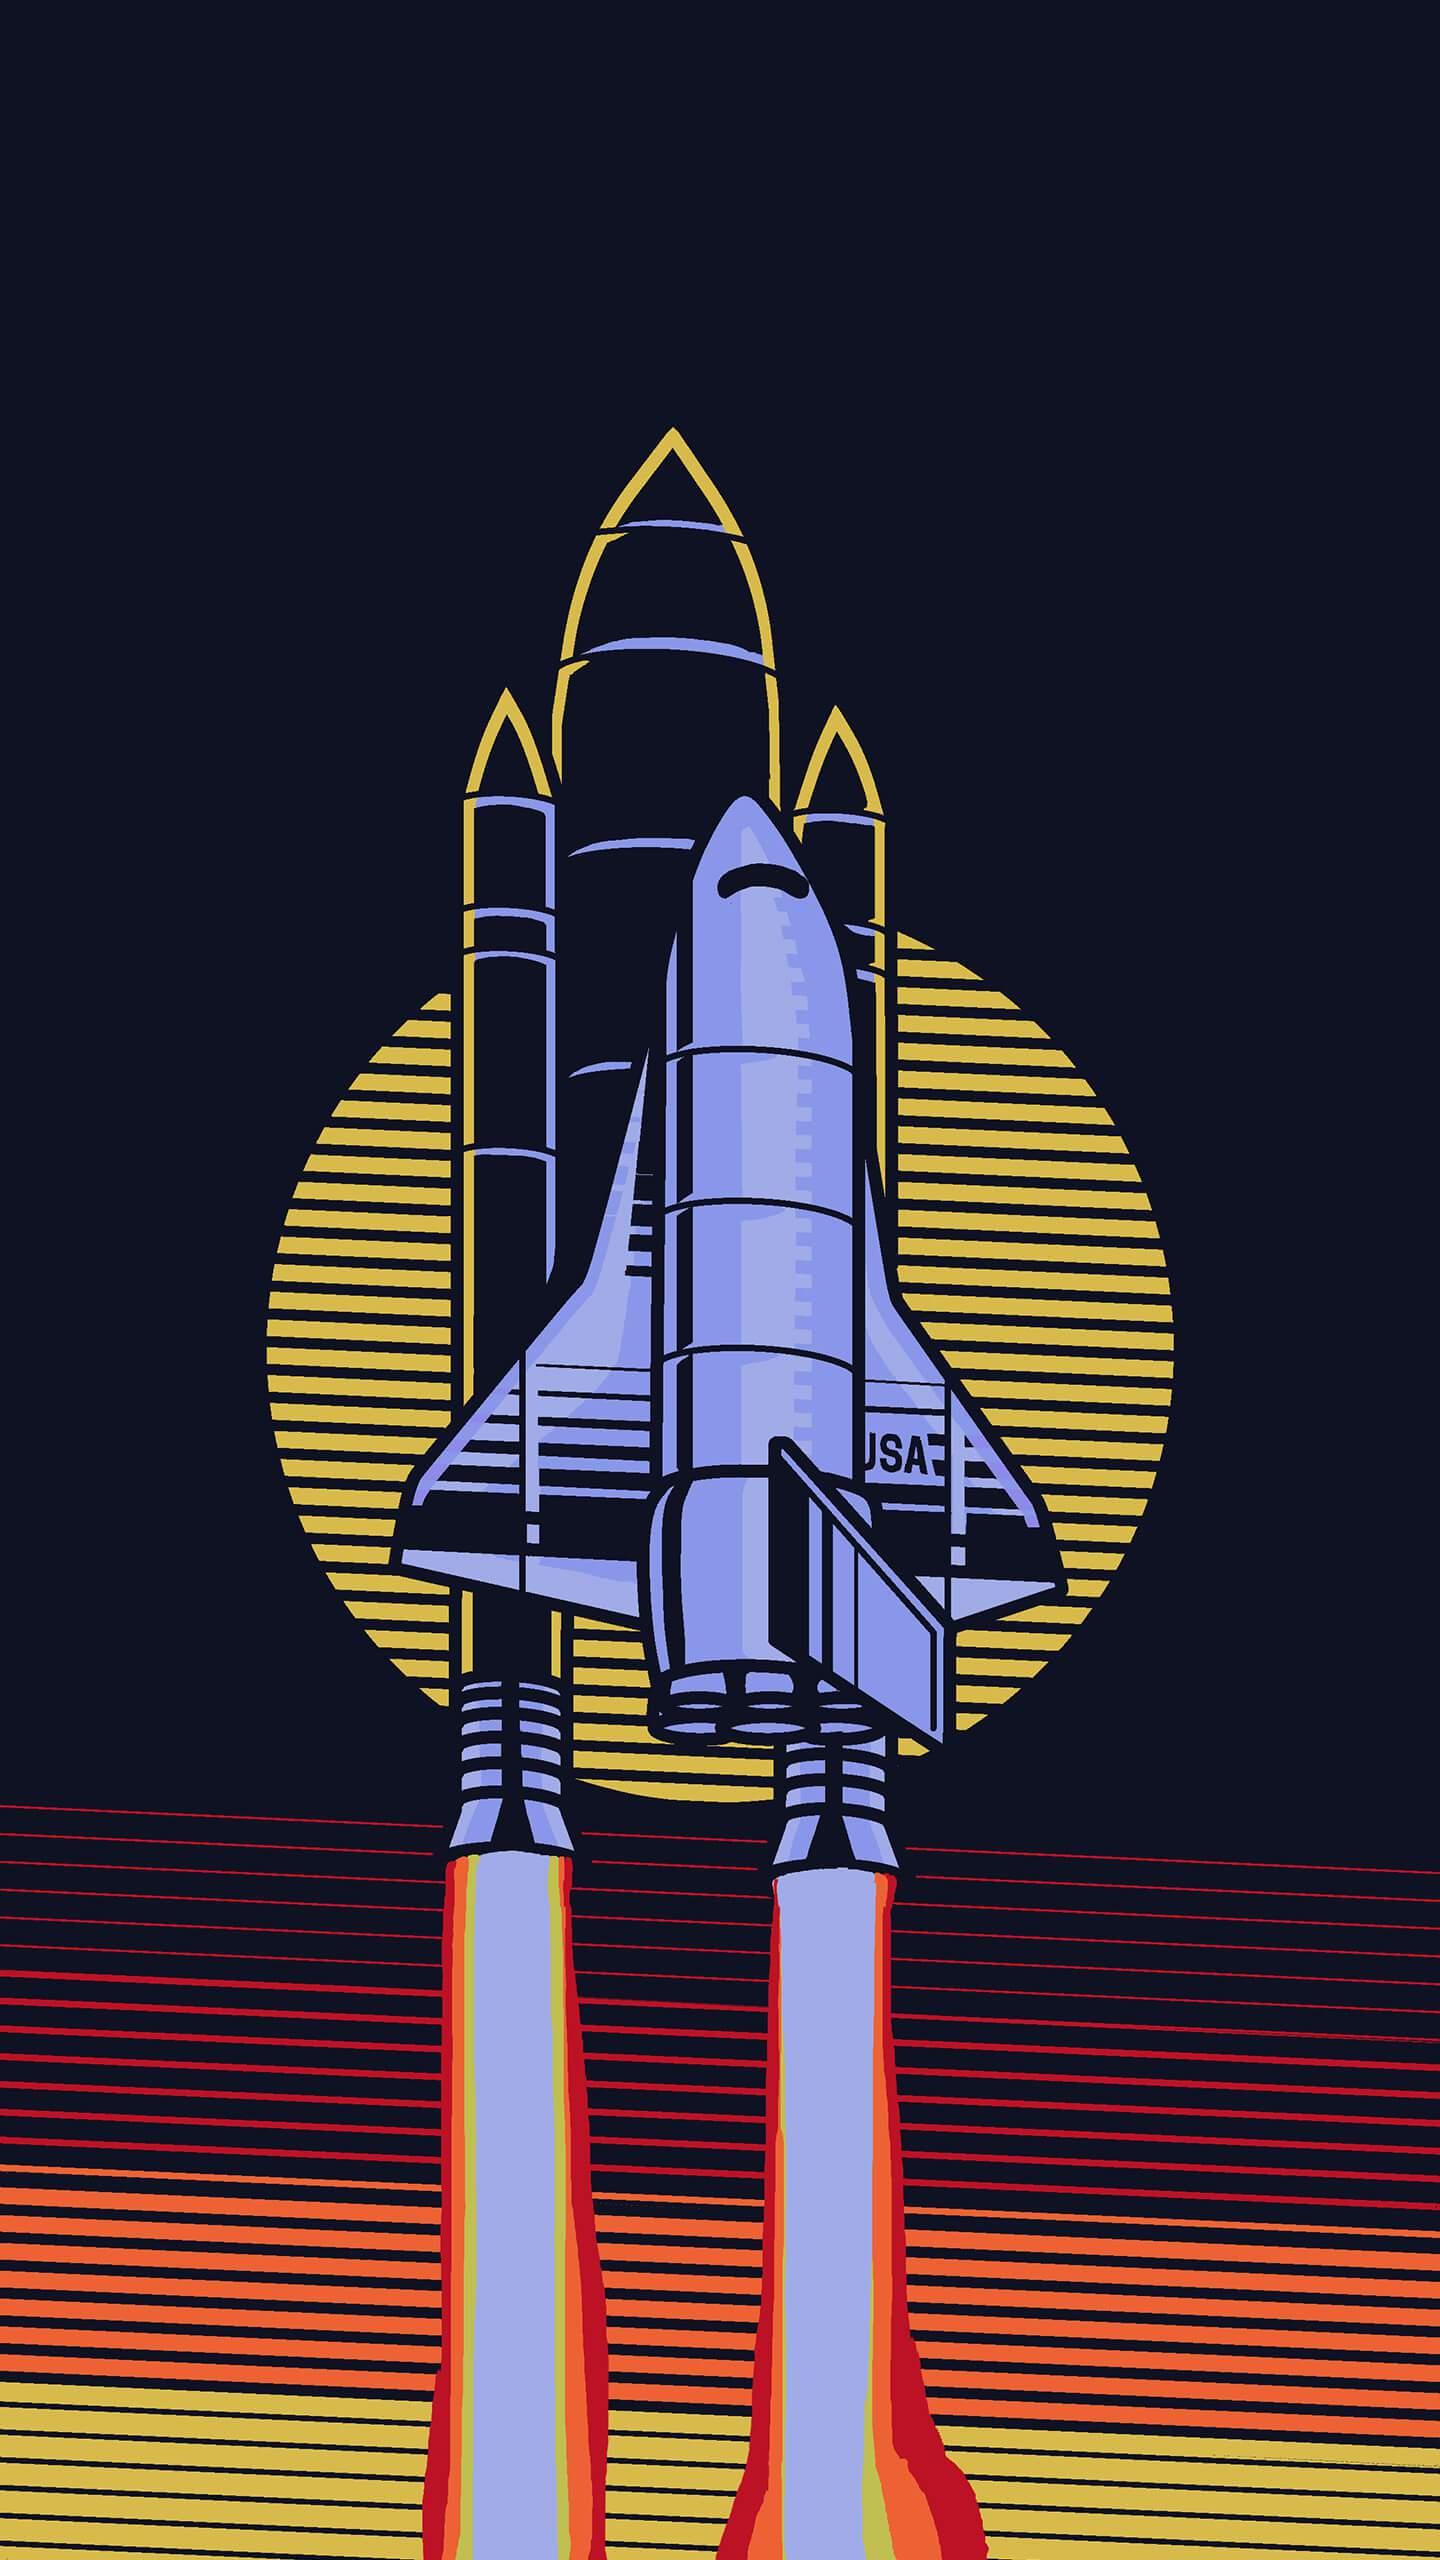 USA Space Shuttle iPhone Wallpaper